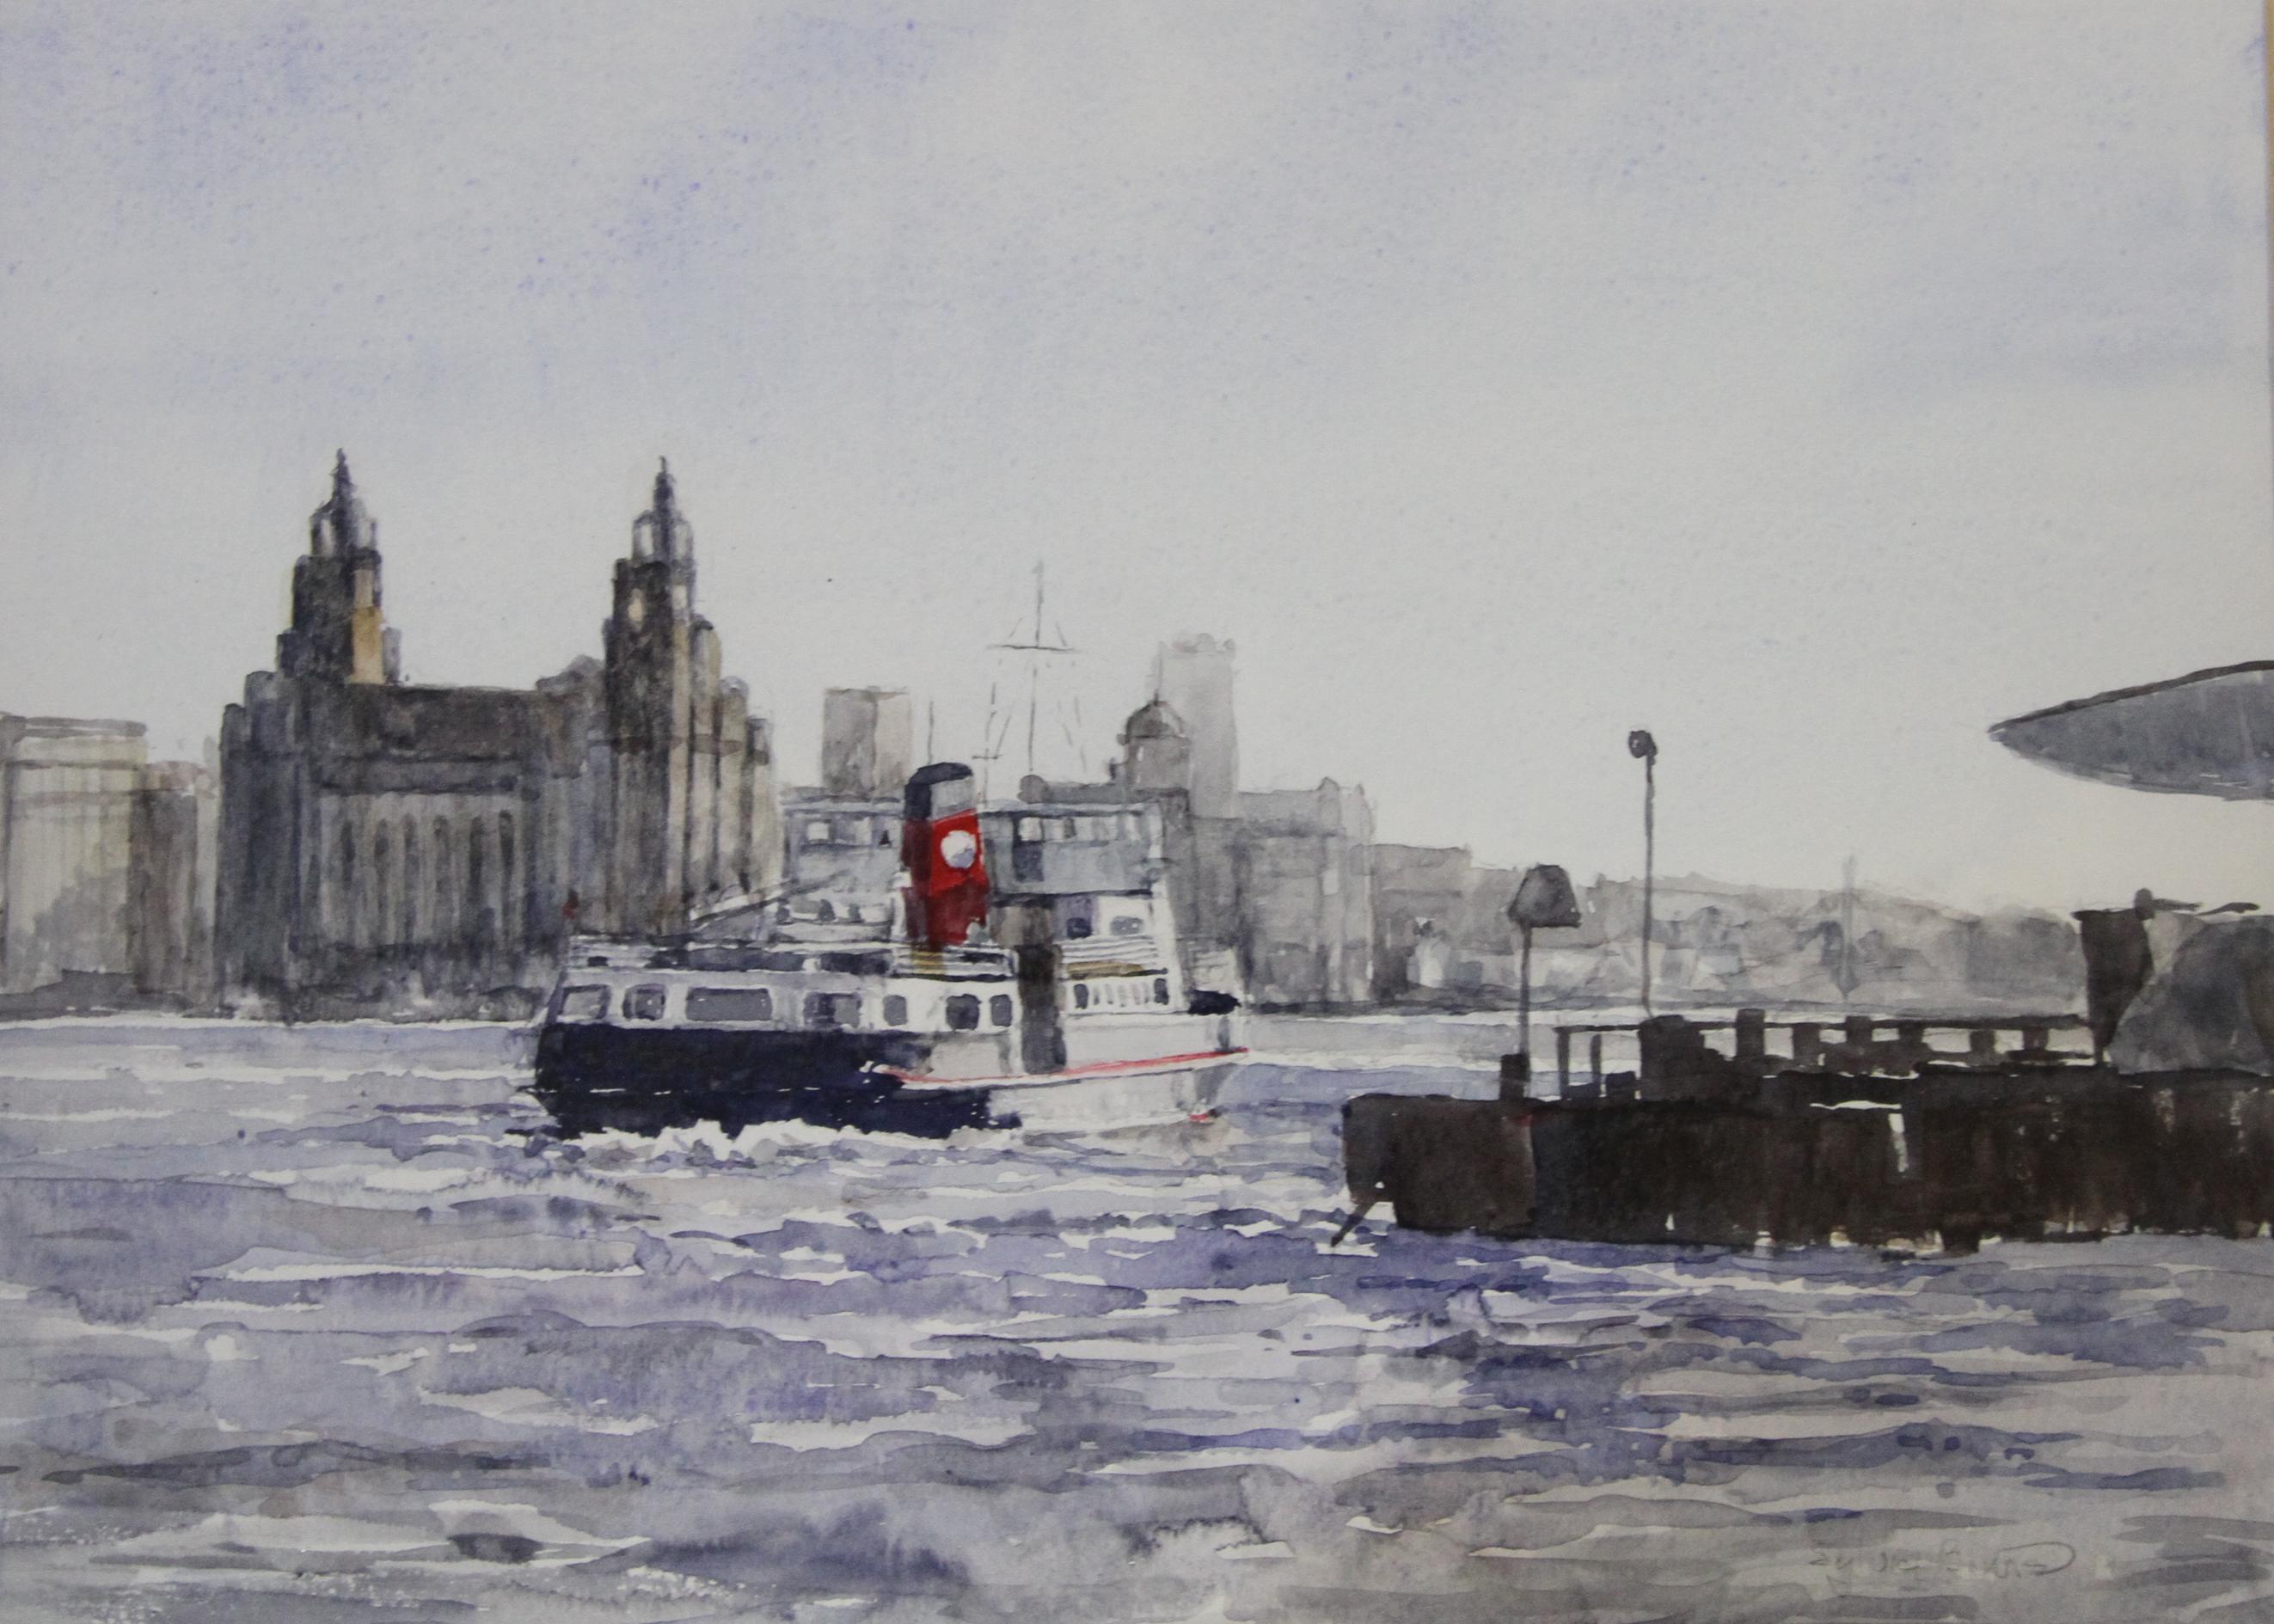 Mersey Ferry, 1990s